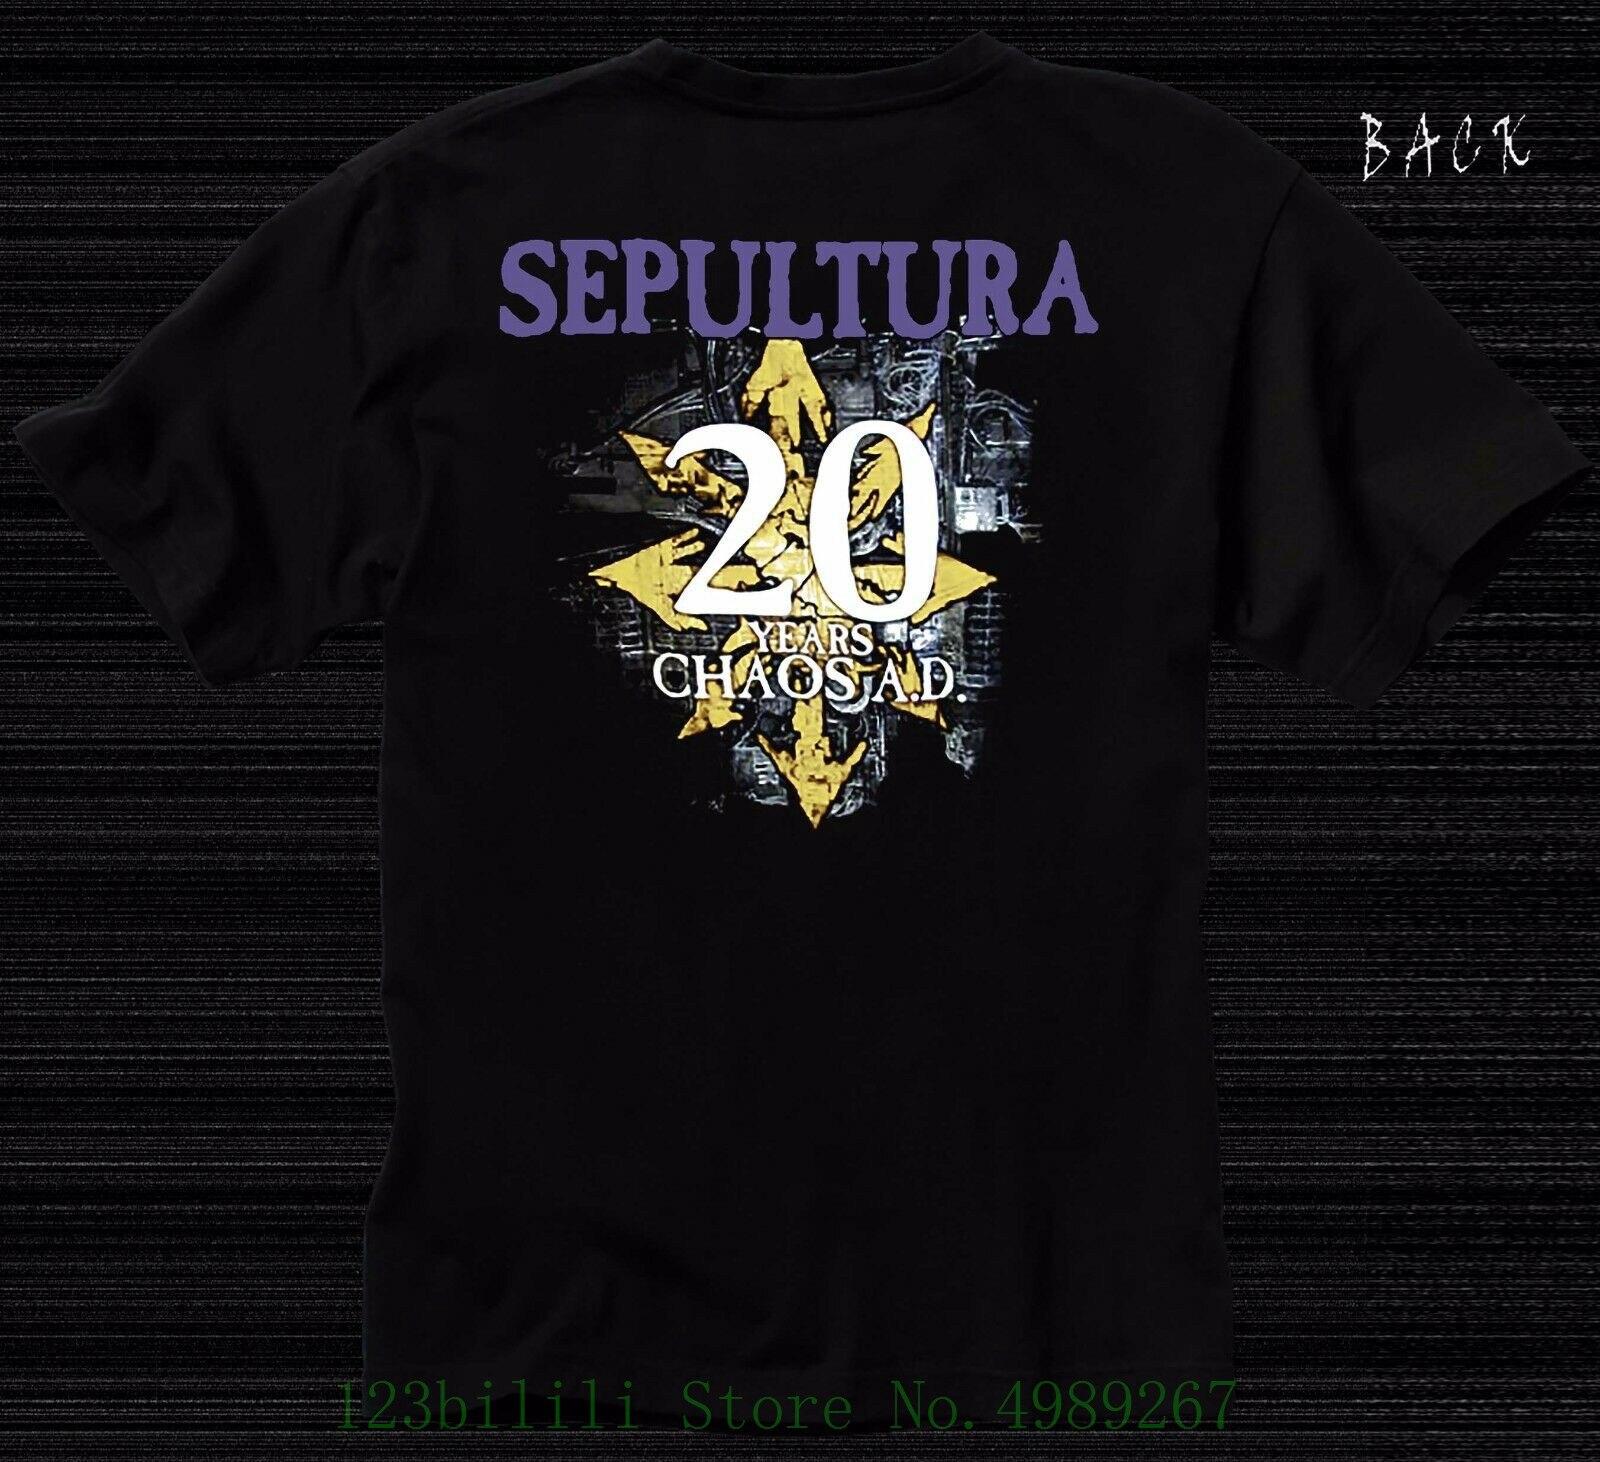 SEPULTURA sizes T/_shirt S to 6XL Brazilian heavy metal band